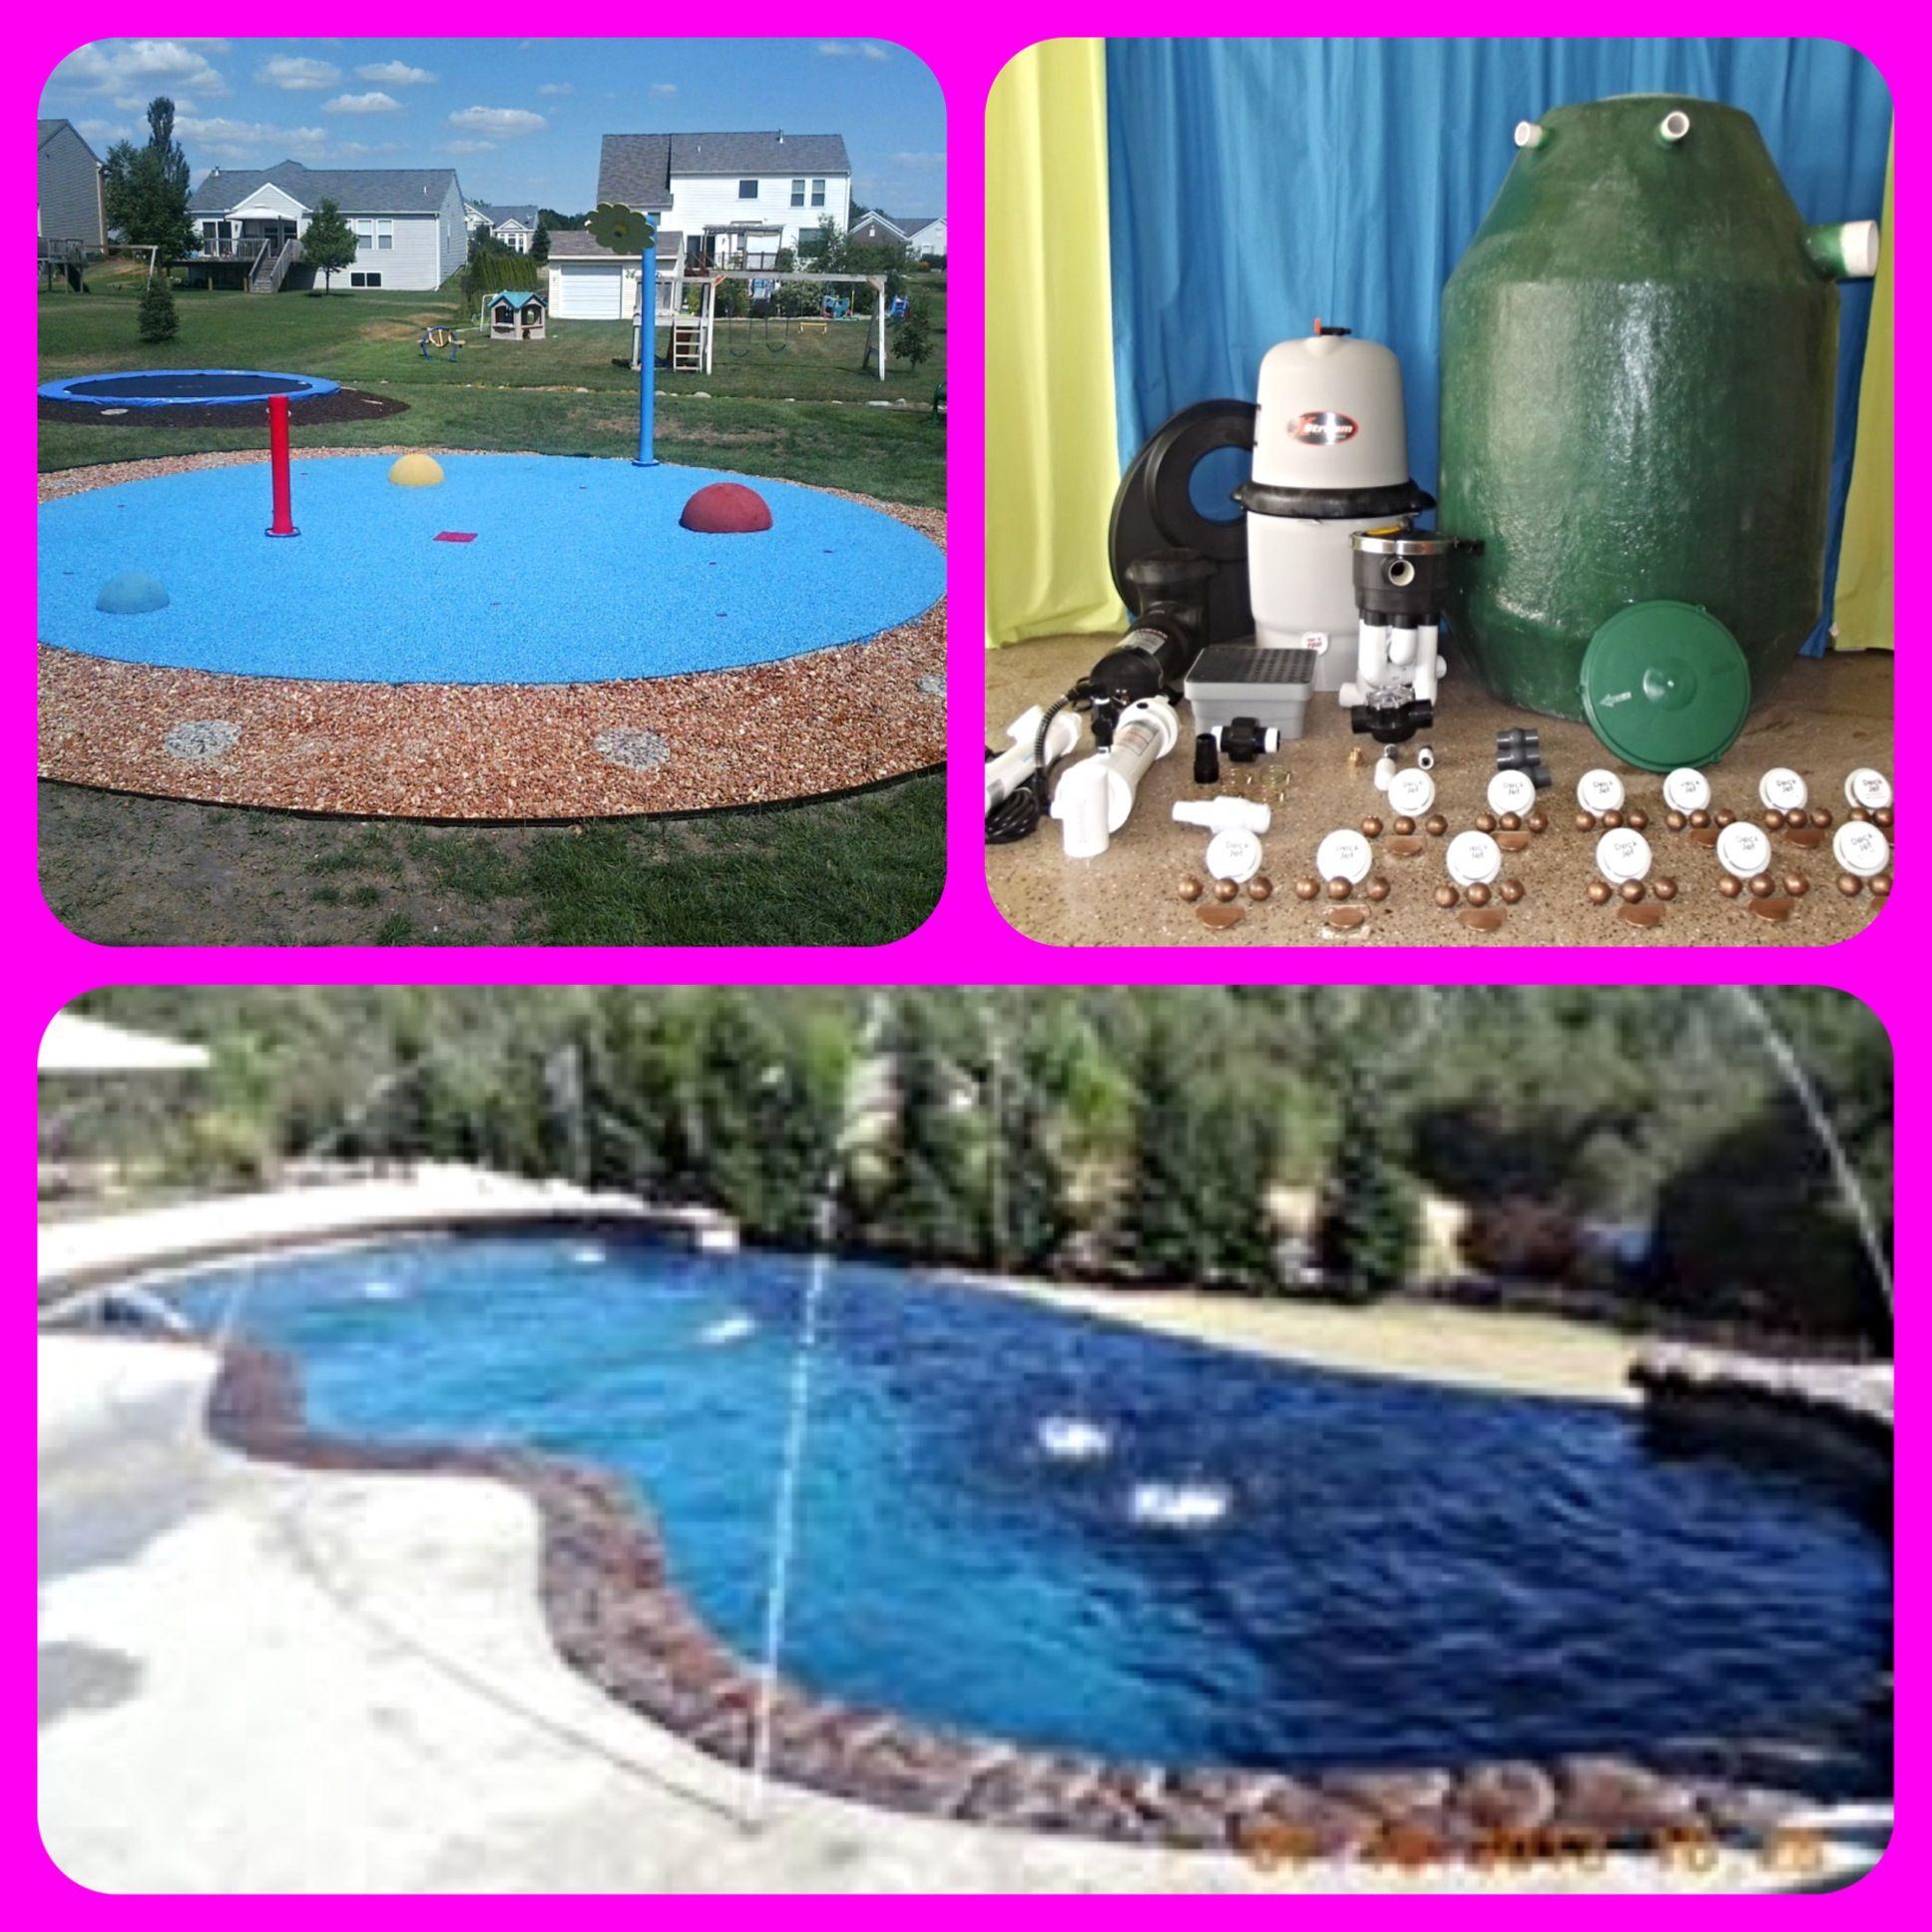 Splash Swimming Pools: My Splash Pad Residential Backyard Splash Park Install